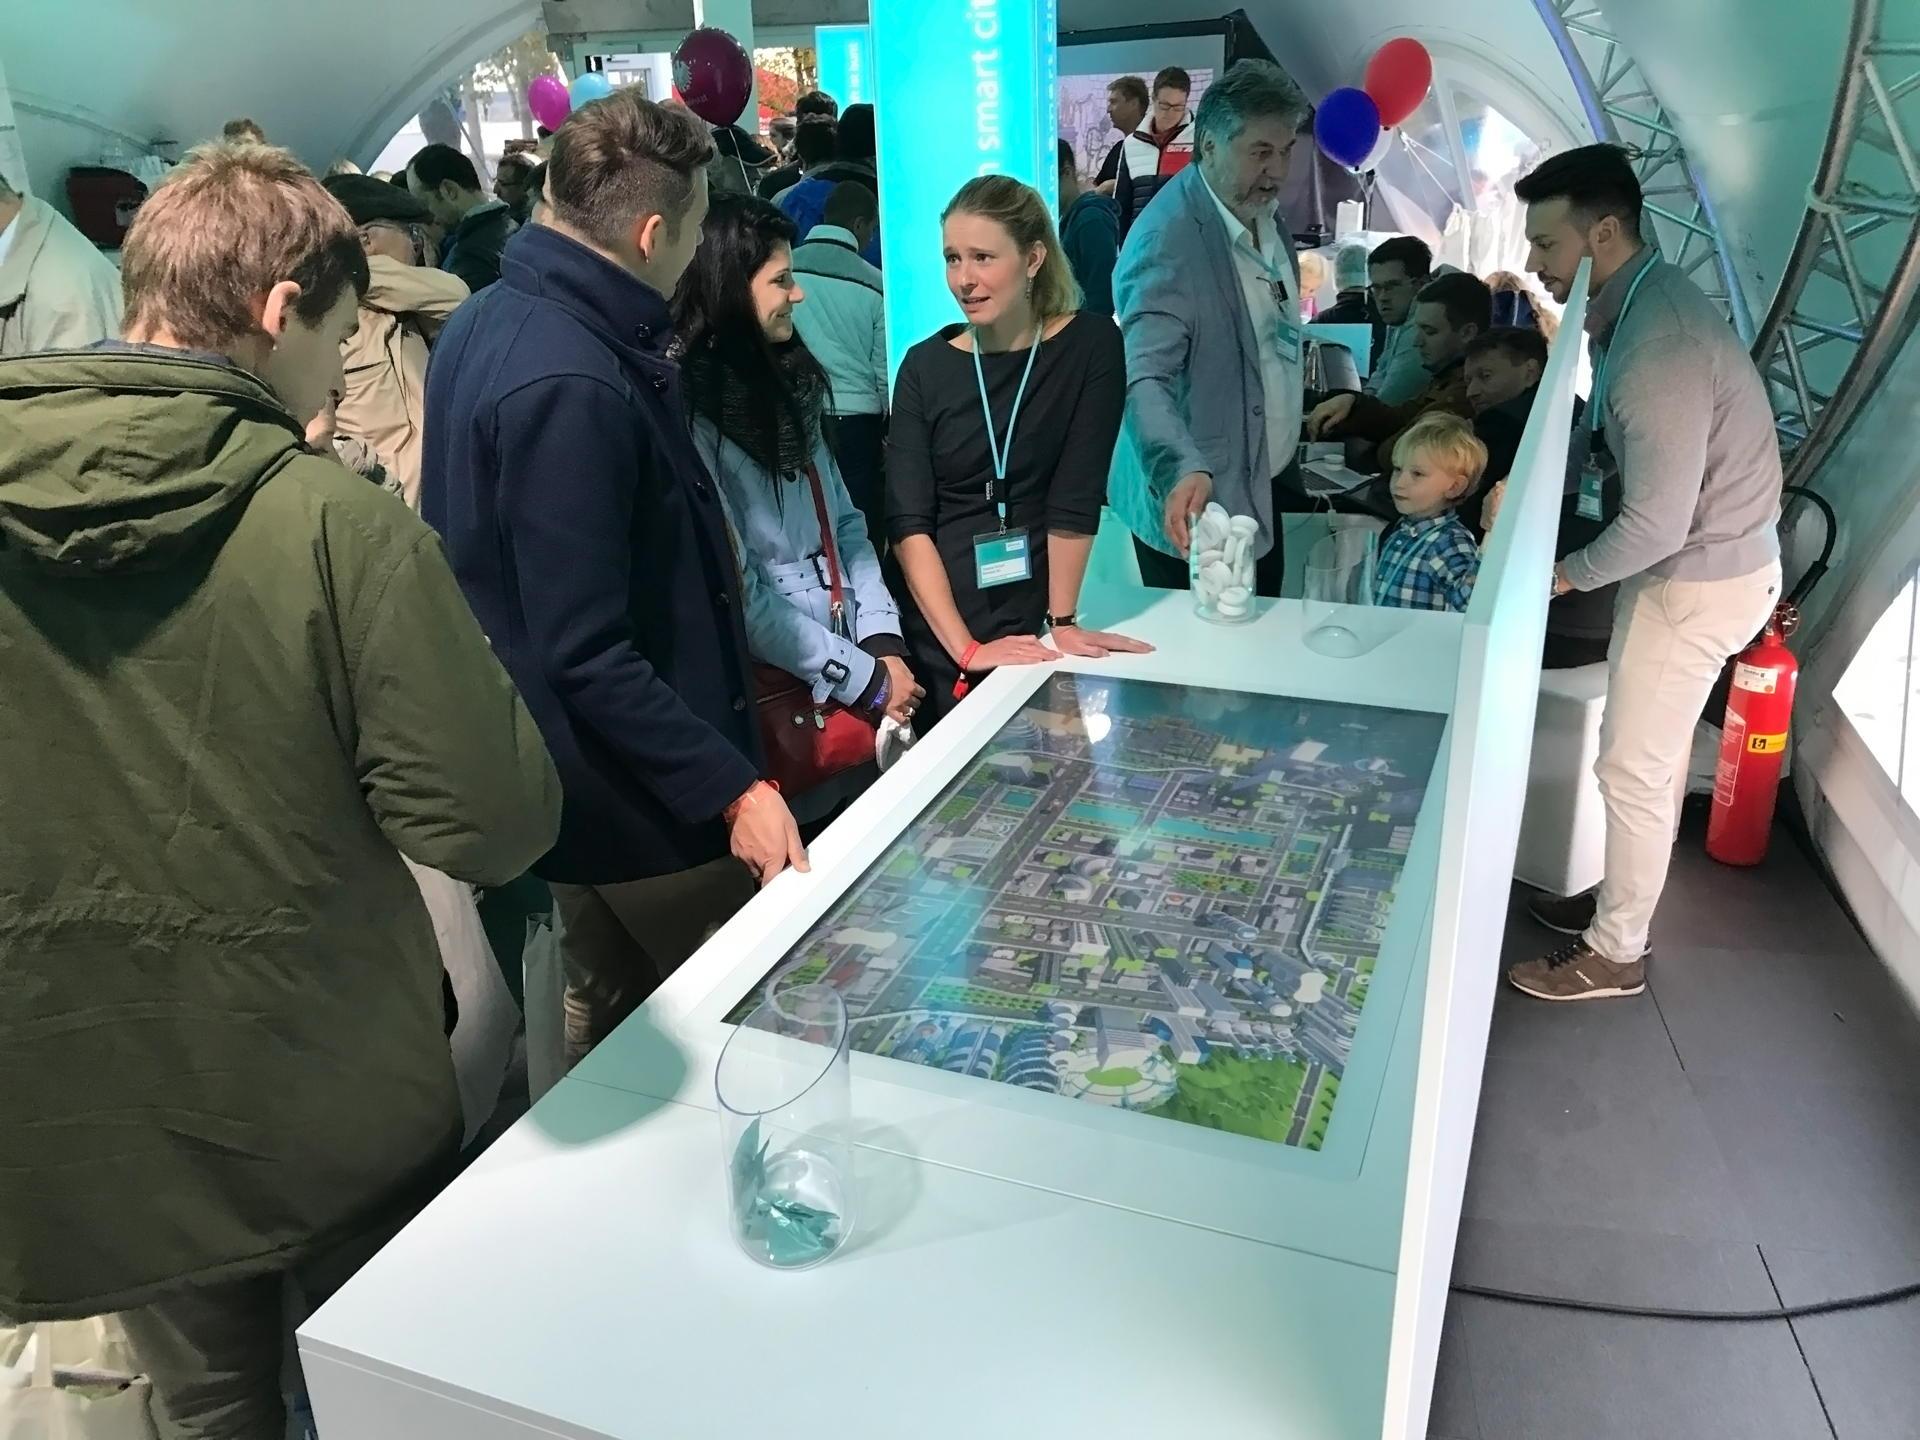 Stadt_der_Zukunft_pong_li_1